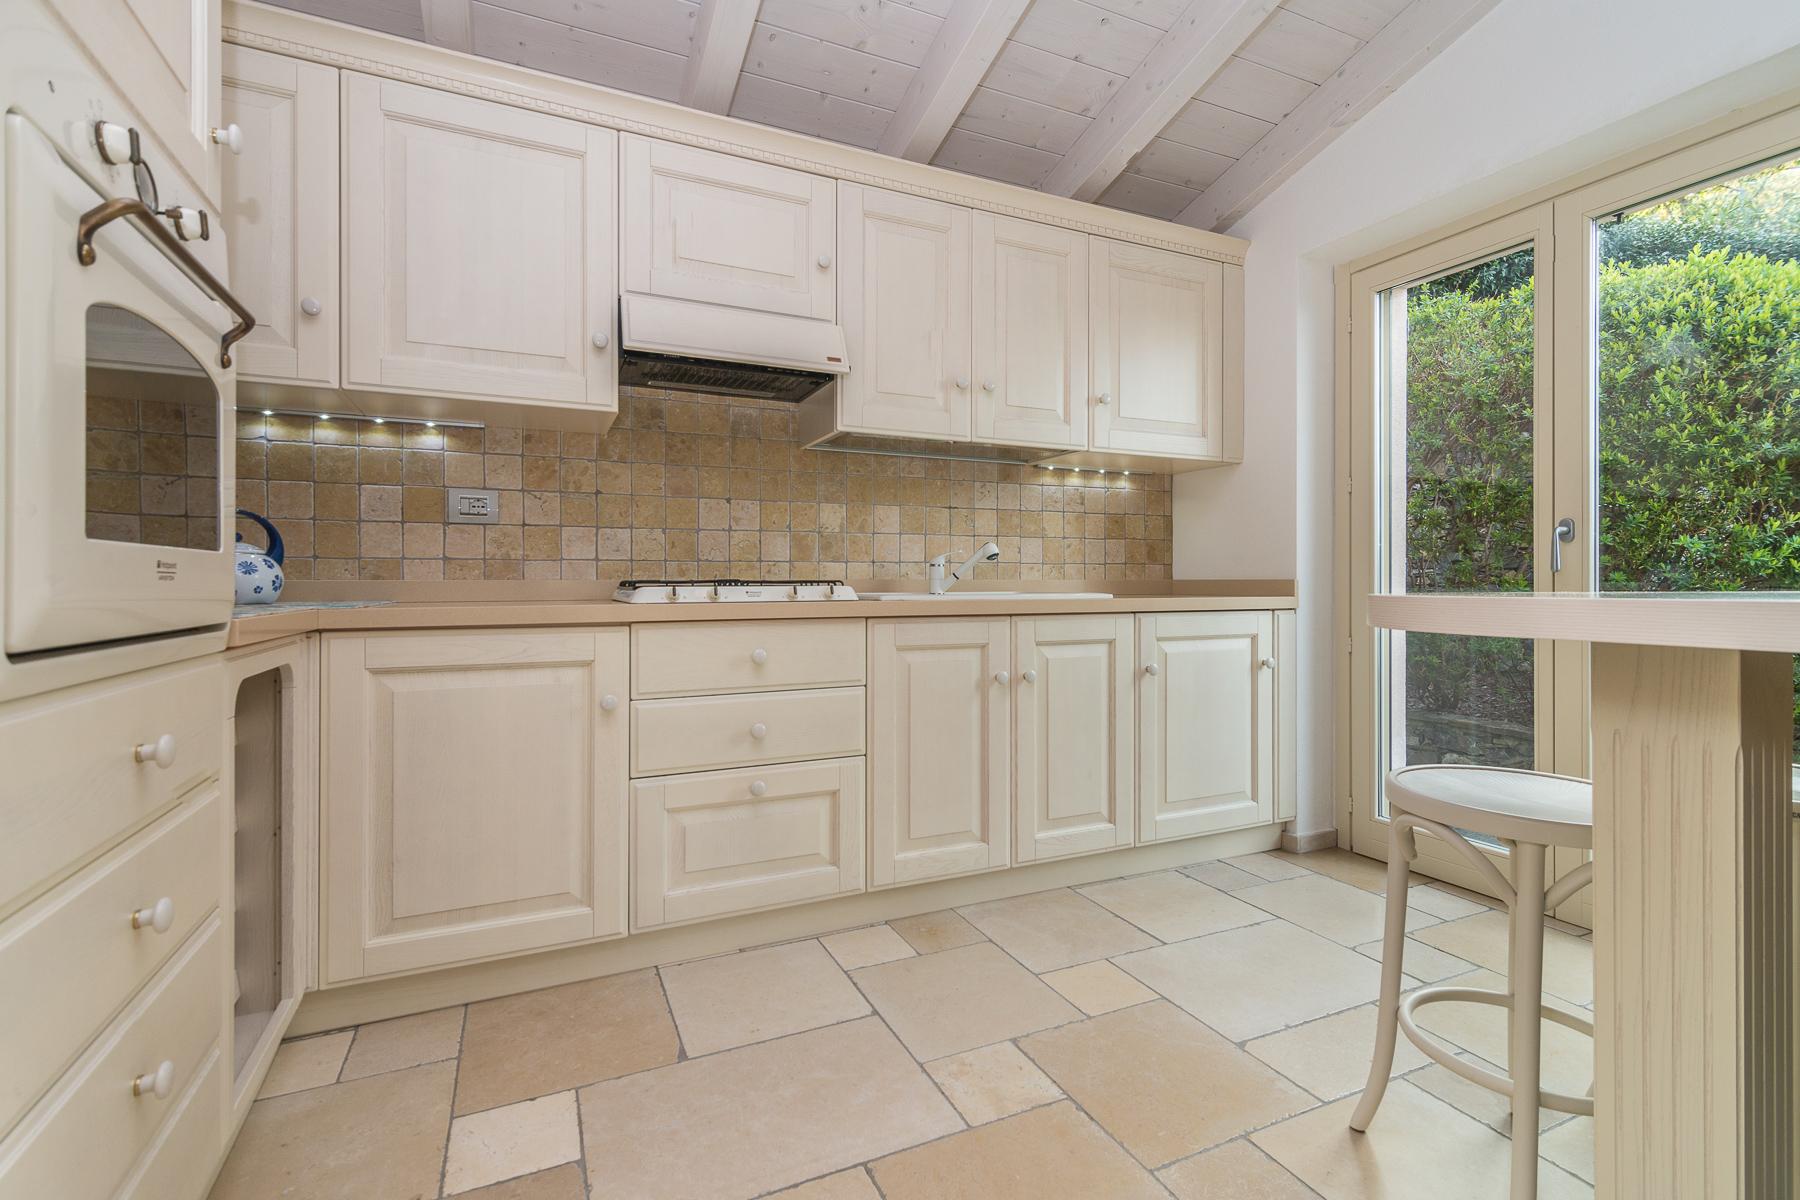 Additional photo for property listing at Charming villa with views on the Italian Riviera Via Solari e Queirolo Zoagli, Genoa 16035 Italie